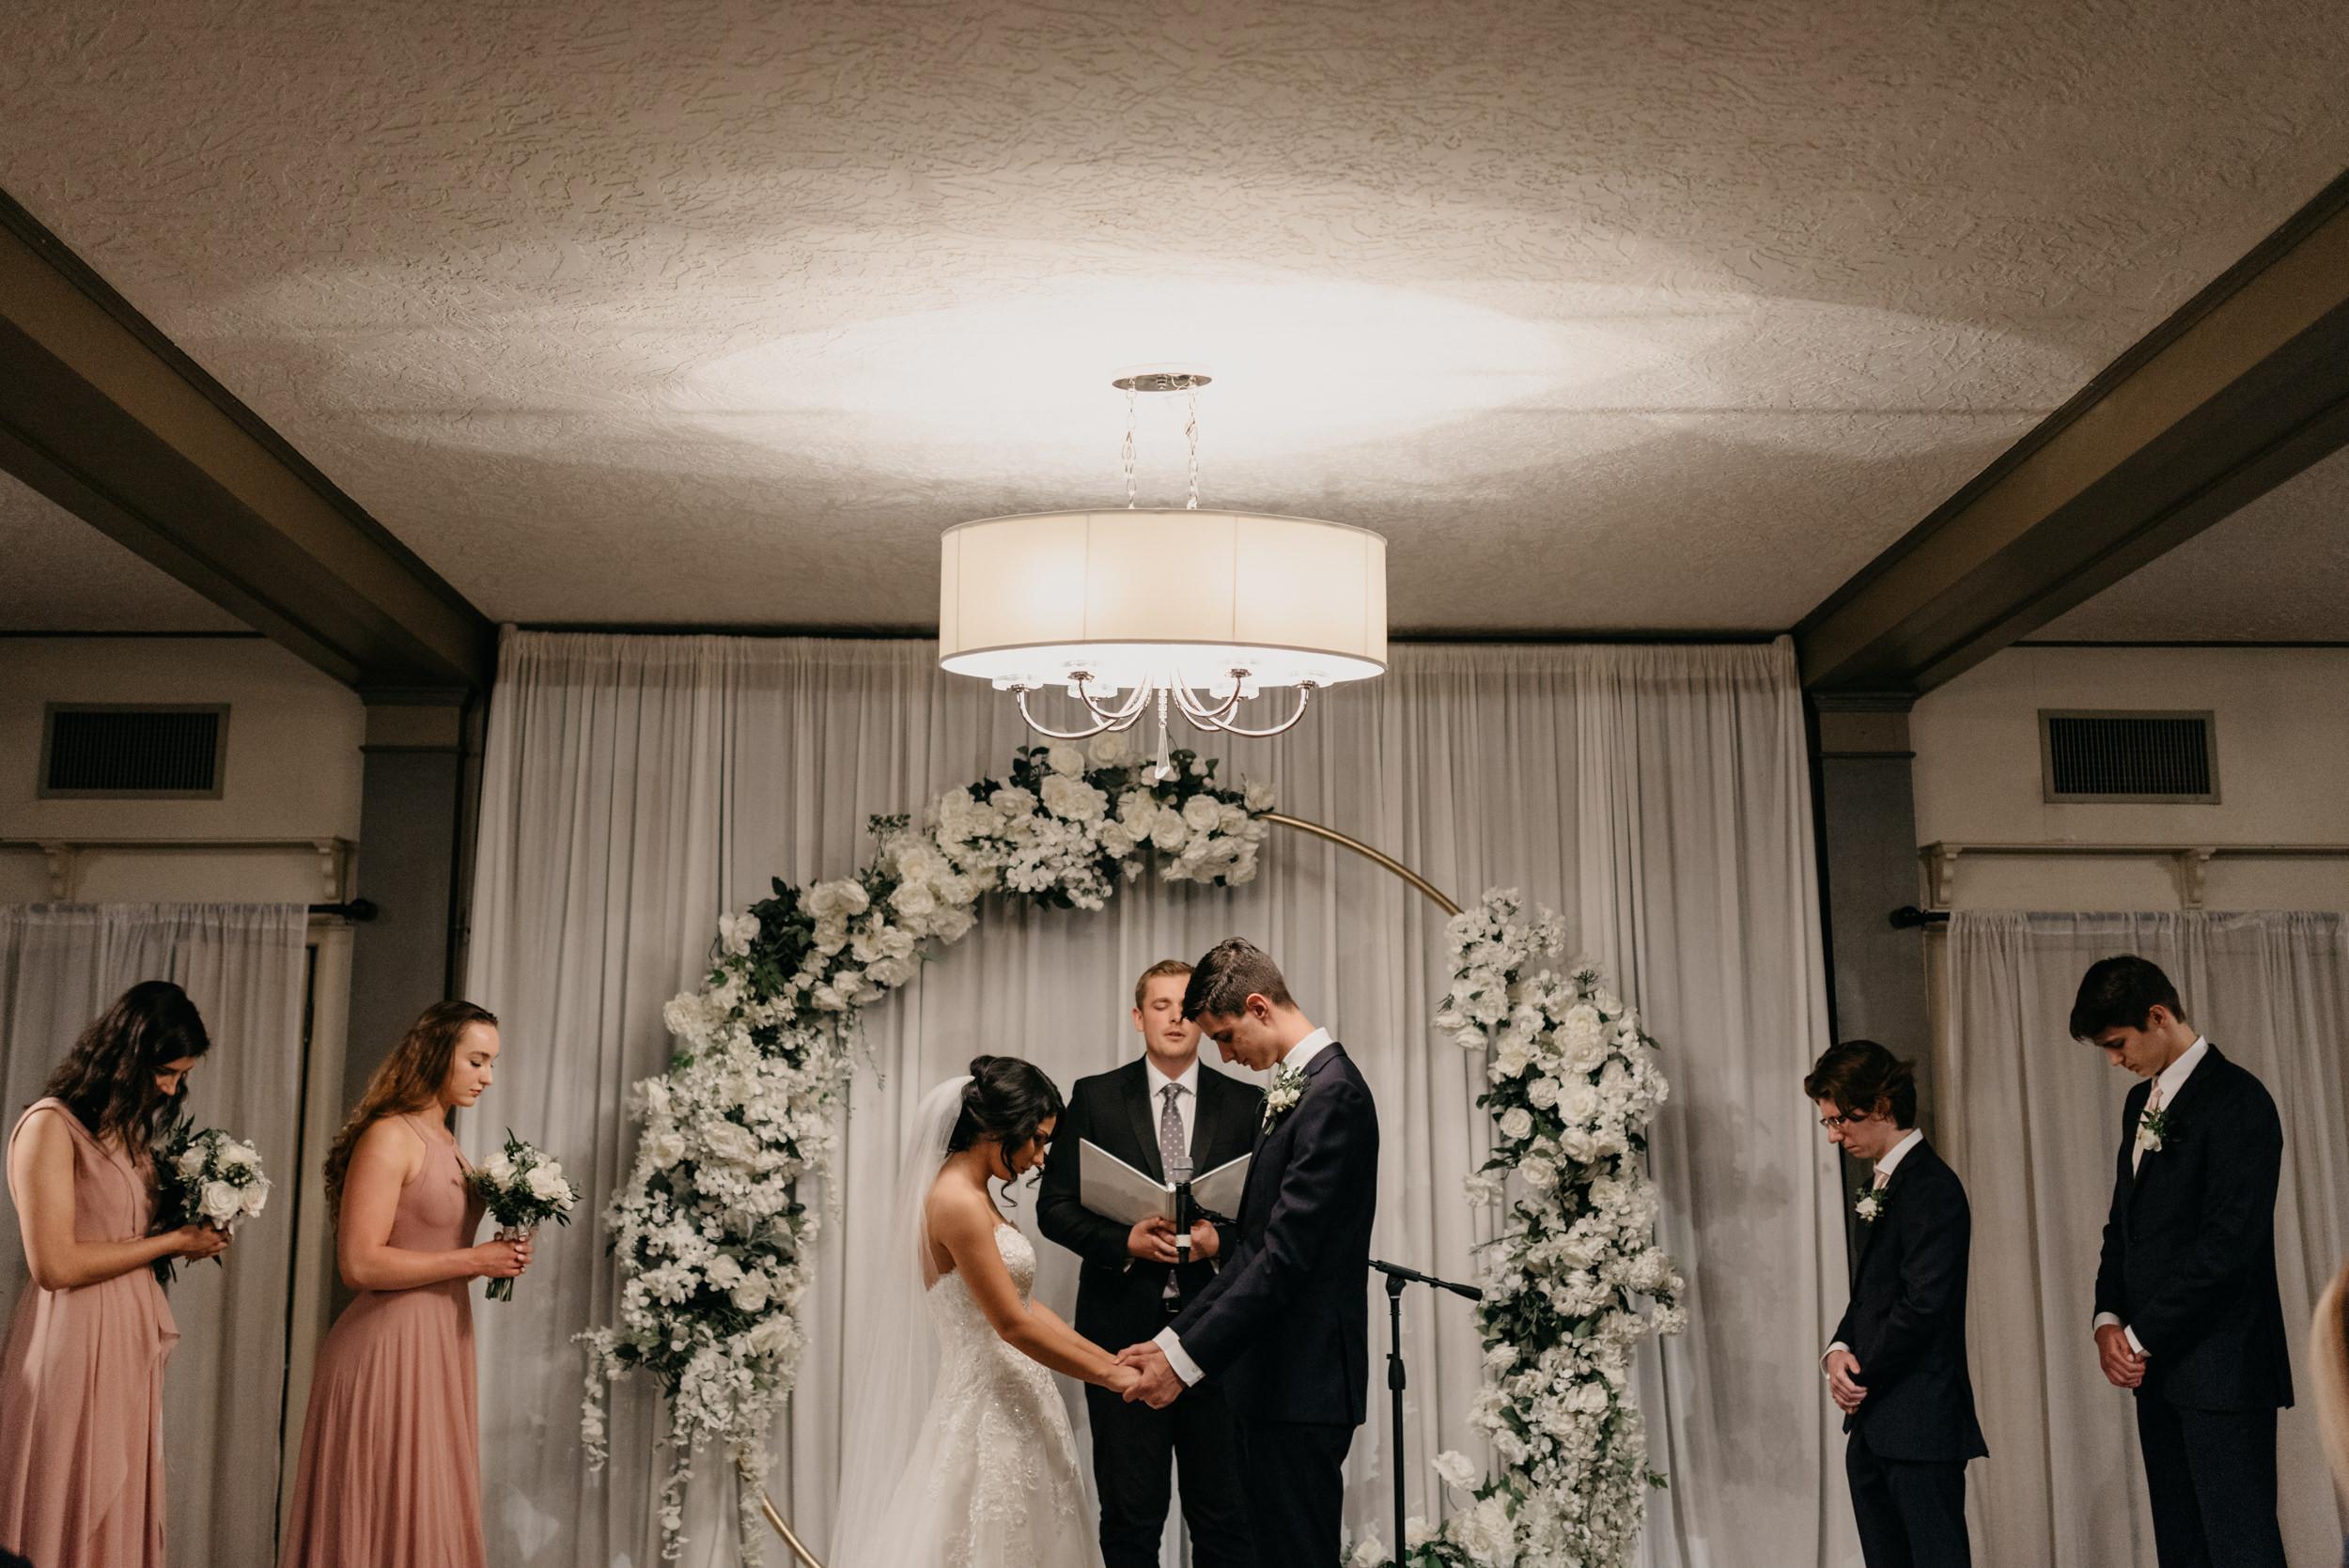 93-ceremony-west-end-ballroom-portland-wedding-venue-8002.jpg